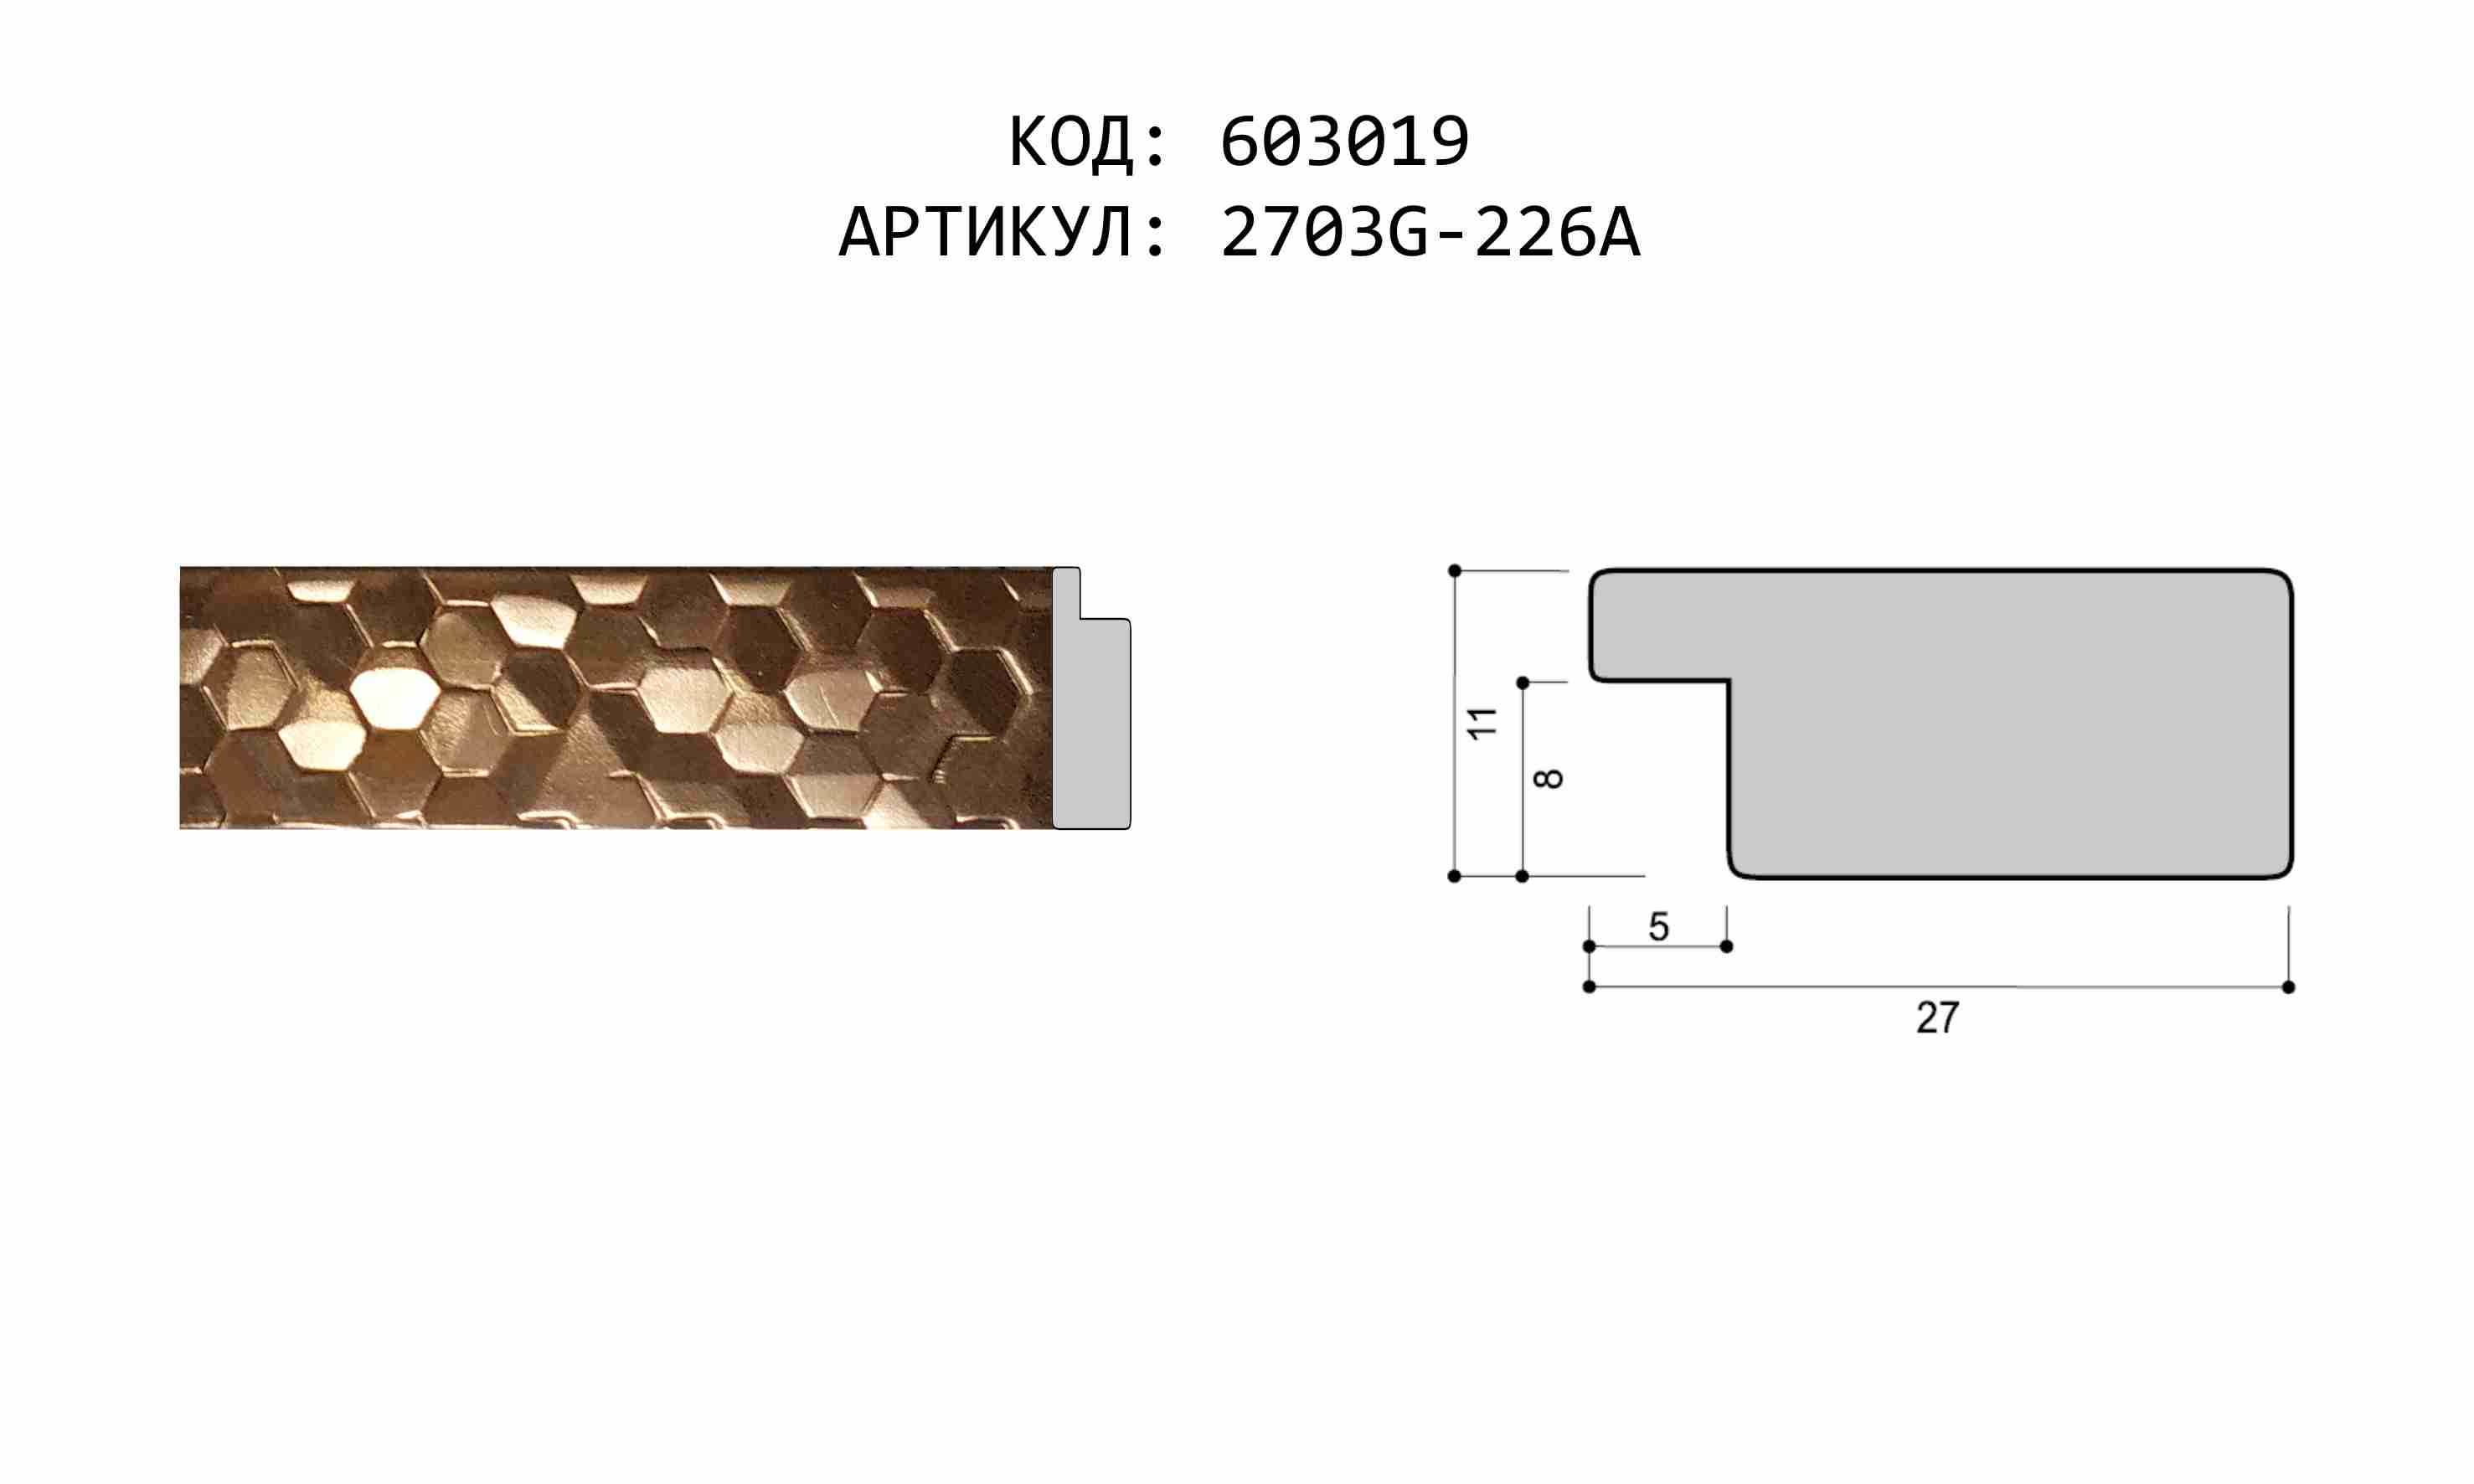 Артикул: 2703G-226A